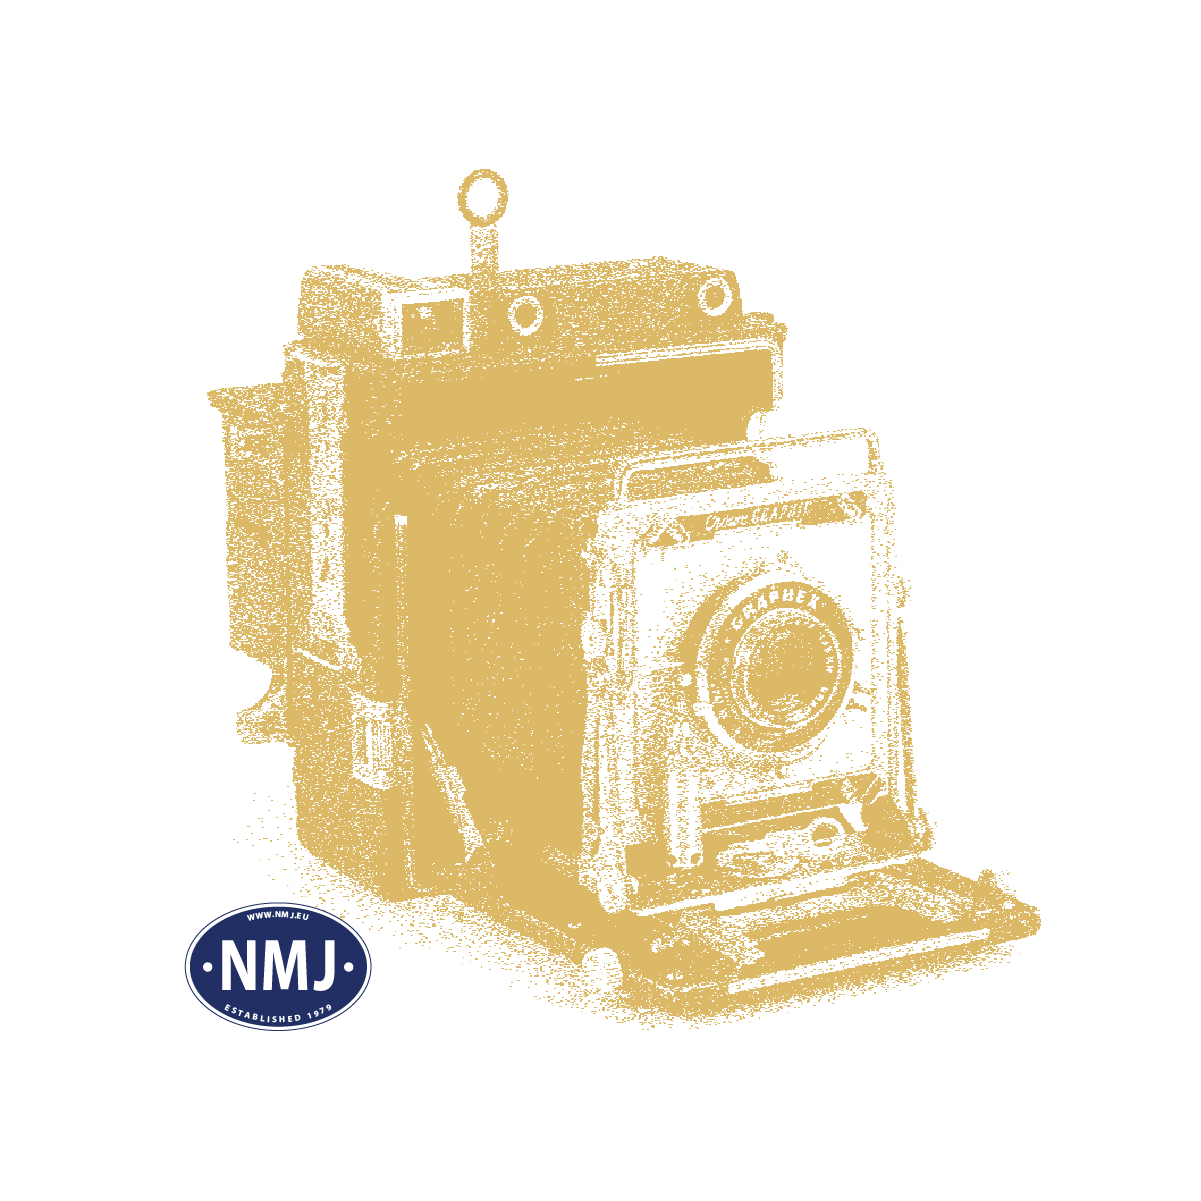 NMJTKAT18 - NMJ Katalogpakke 2018: NMJ Superline, Topline og Skyline